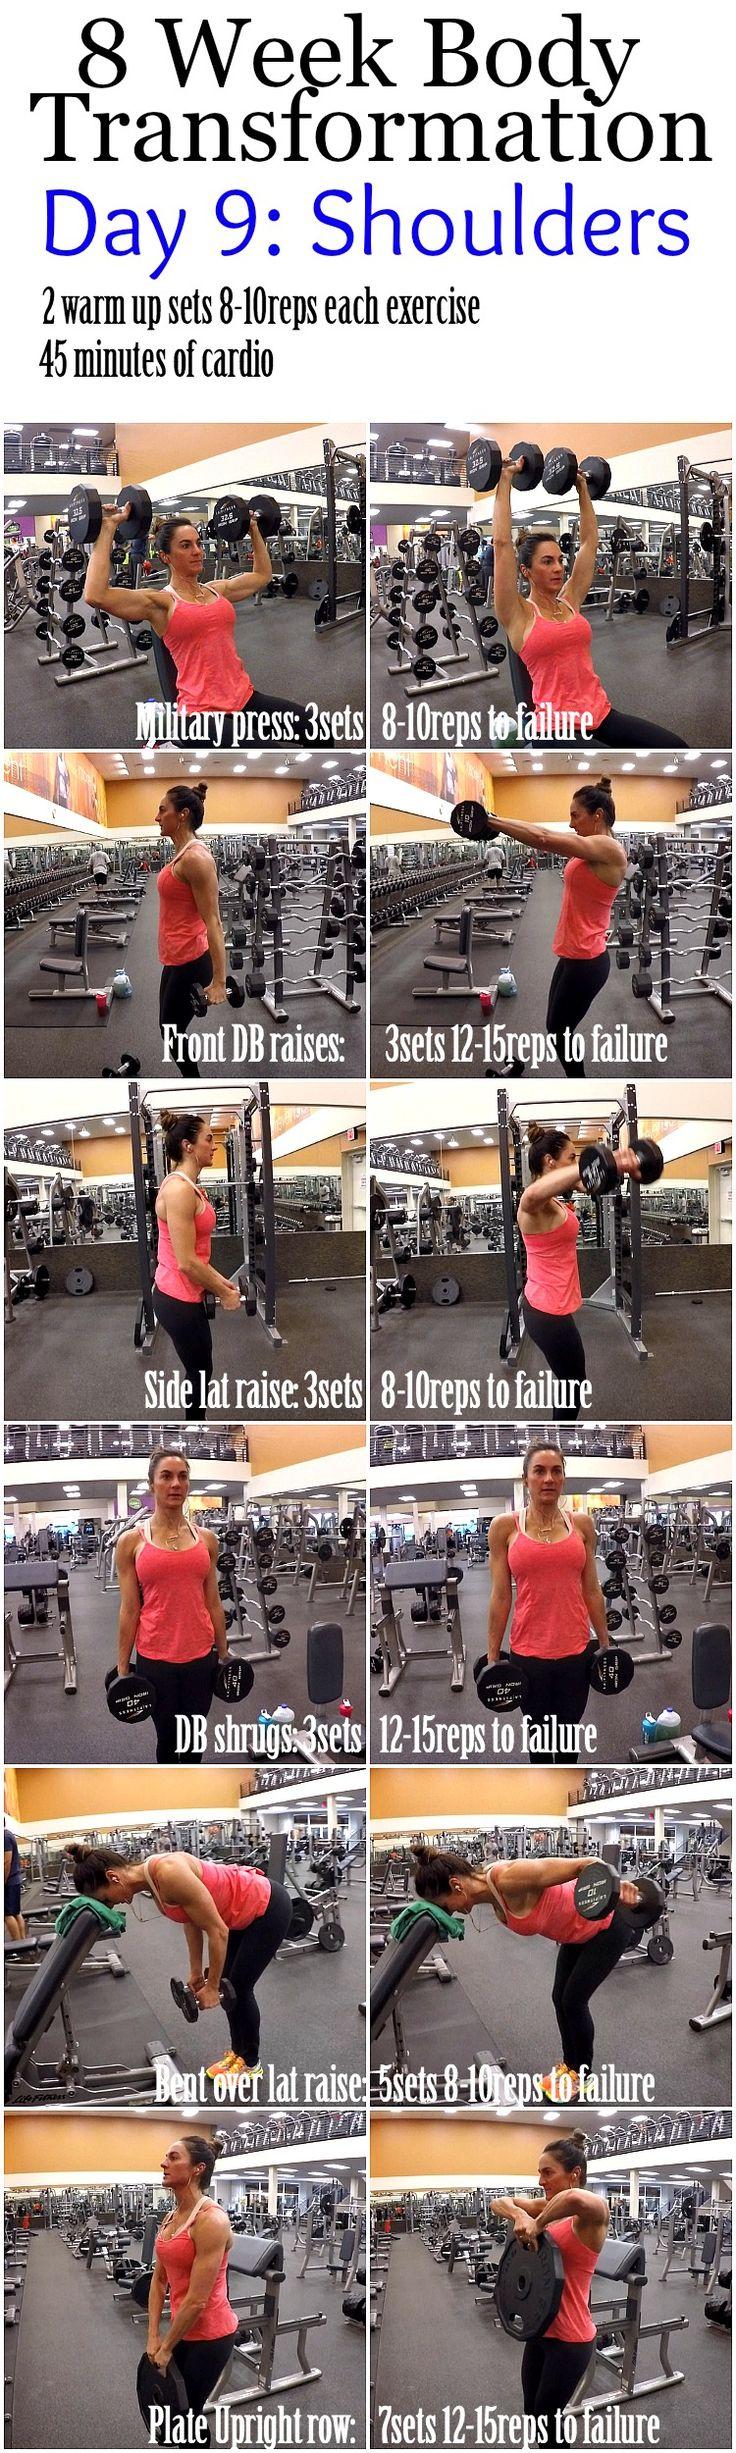 8 Week Body Transformation: Day 9 Shoulders